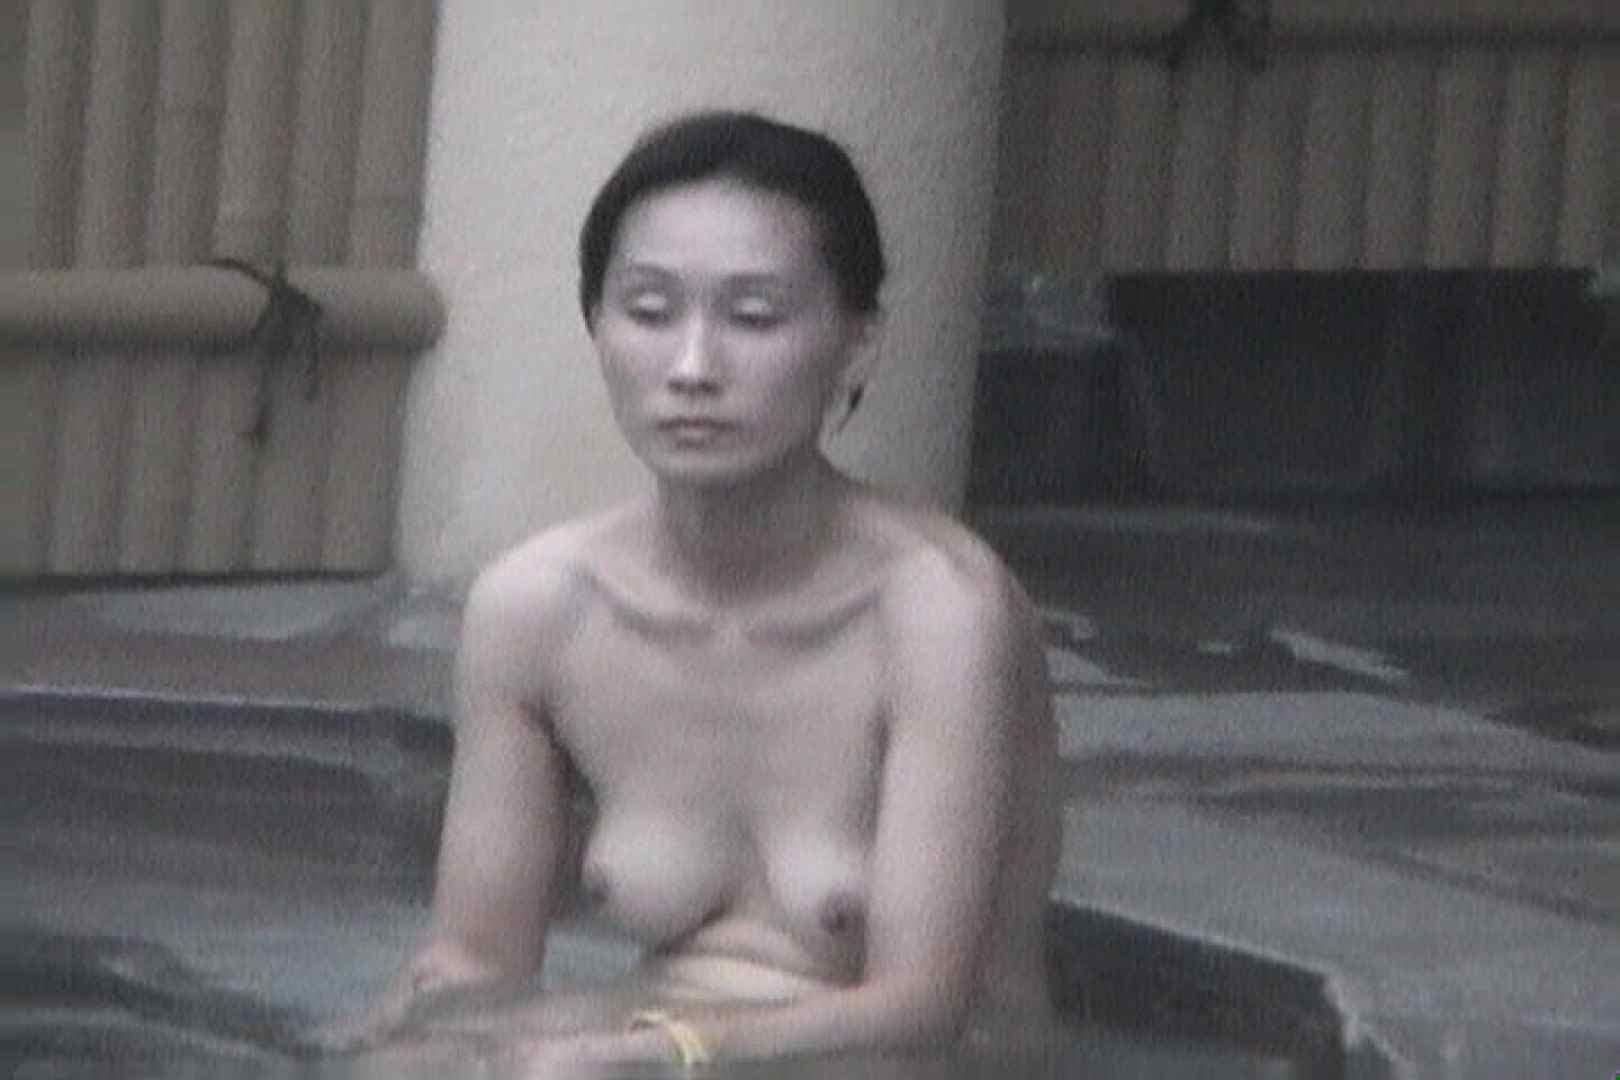 Aquaな露天風呂Vol.557 OLのエロ生活 | 露天風呂  34連発 7